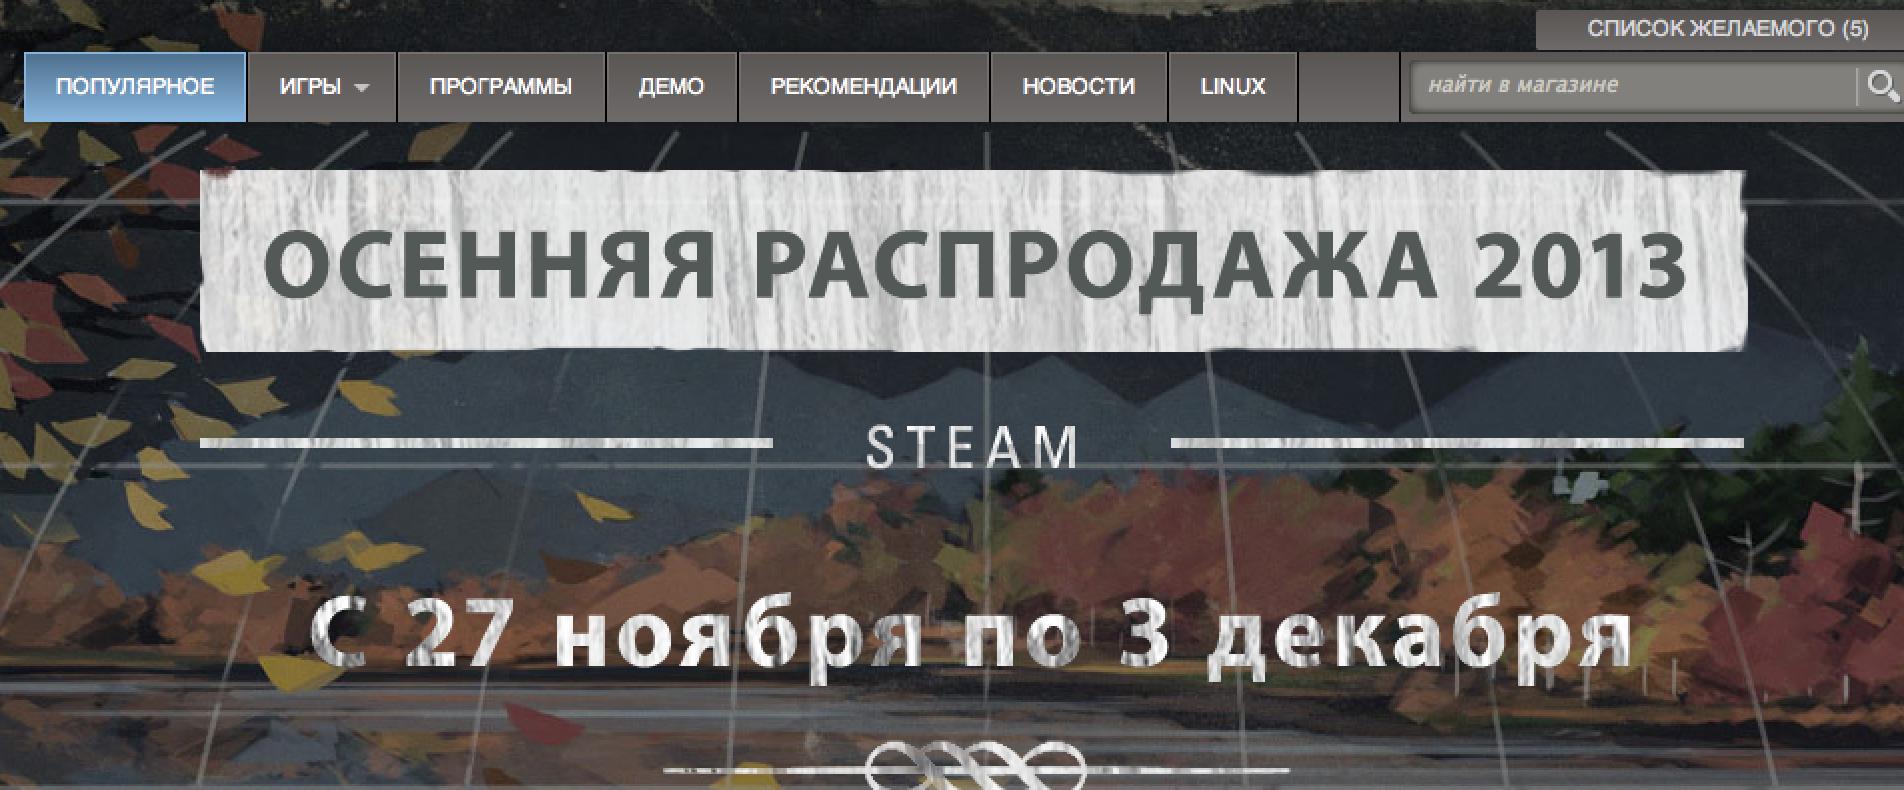 Screenshot 2013-11-28 14.11.11